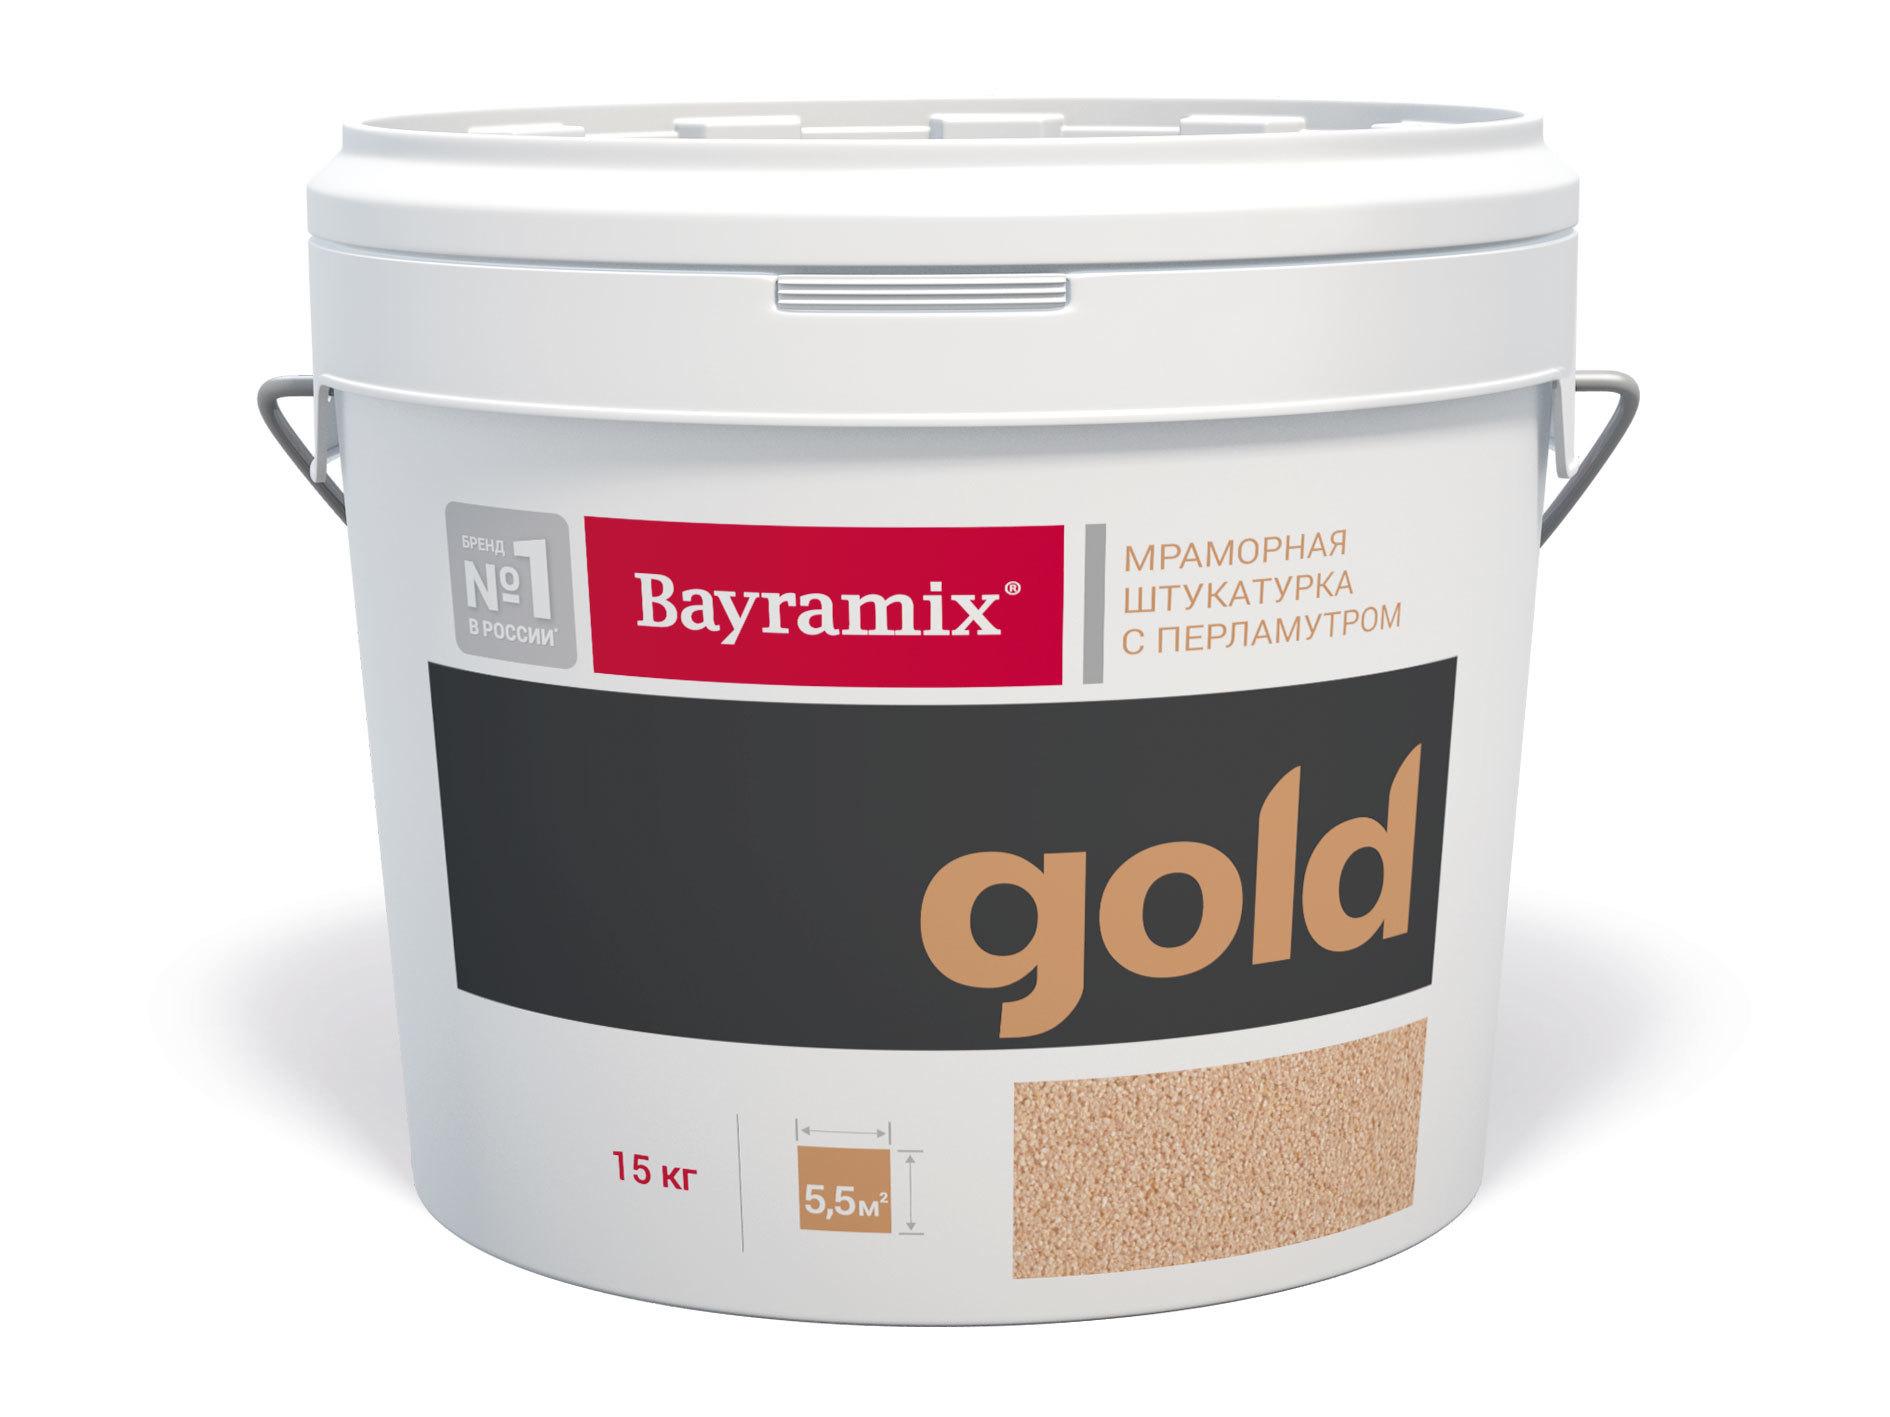 Штукатурка декоративная мраморная Bayramix Mineral Gold / Байрамикс Минерал Голд